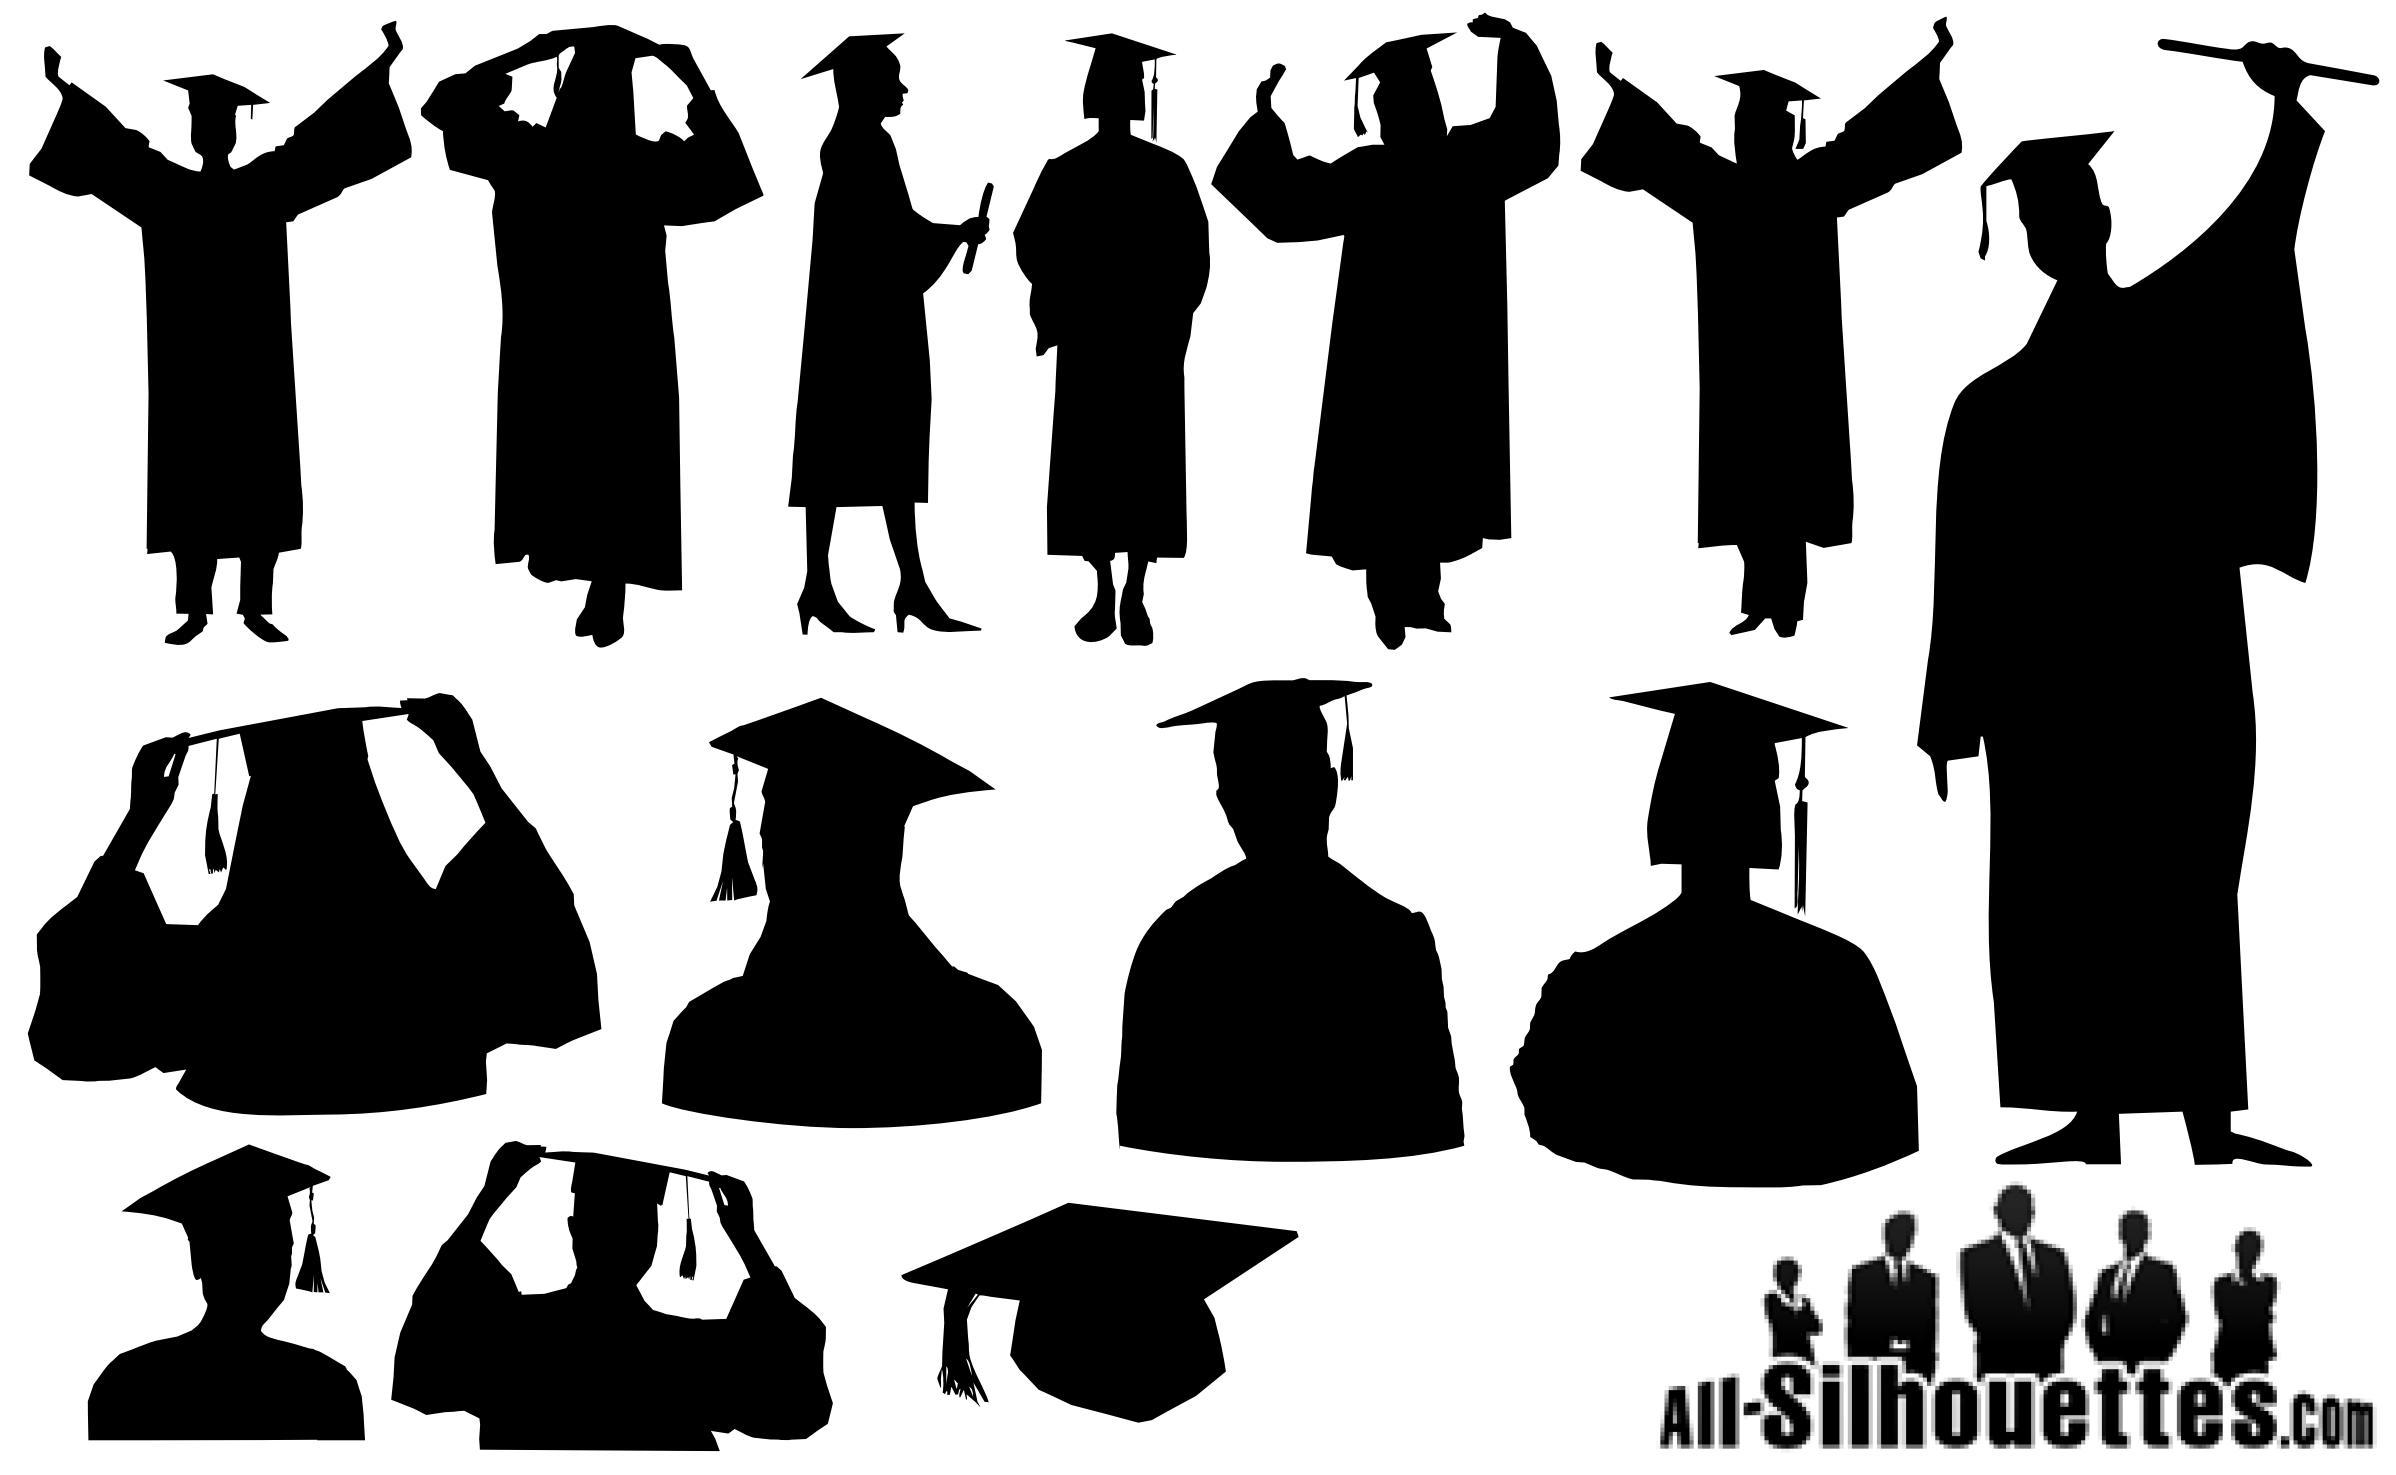 graduated_silhouettes_01